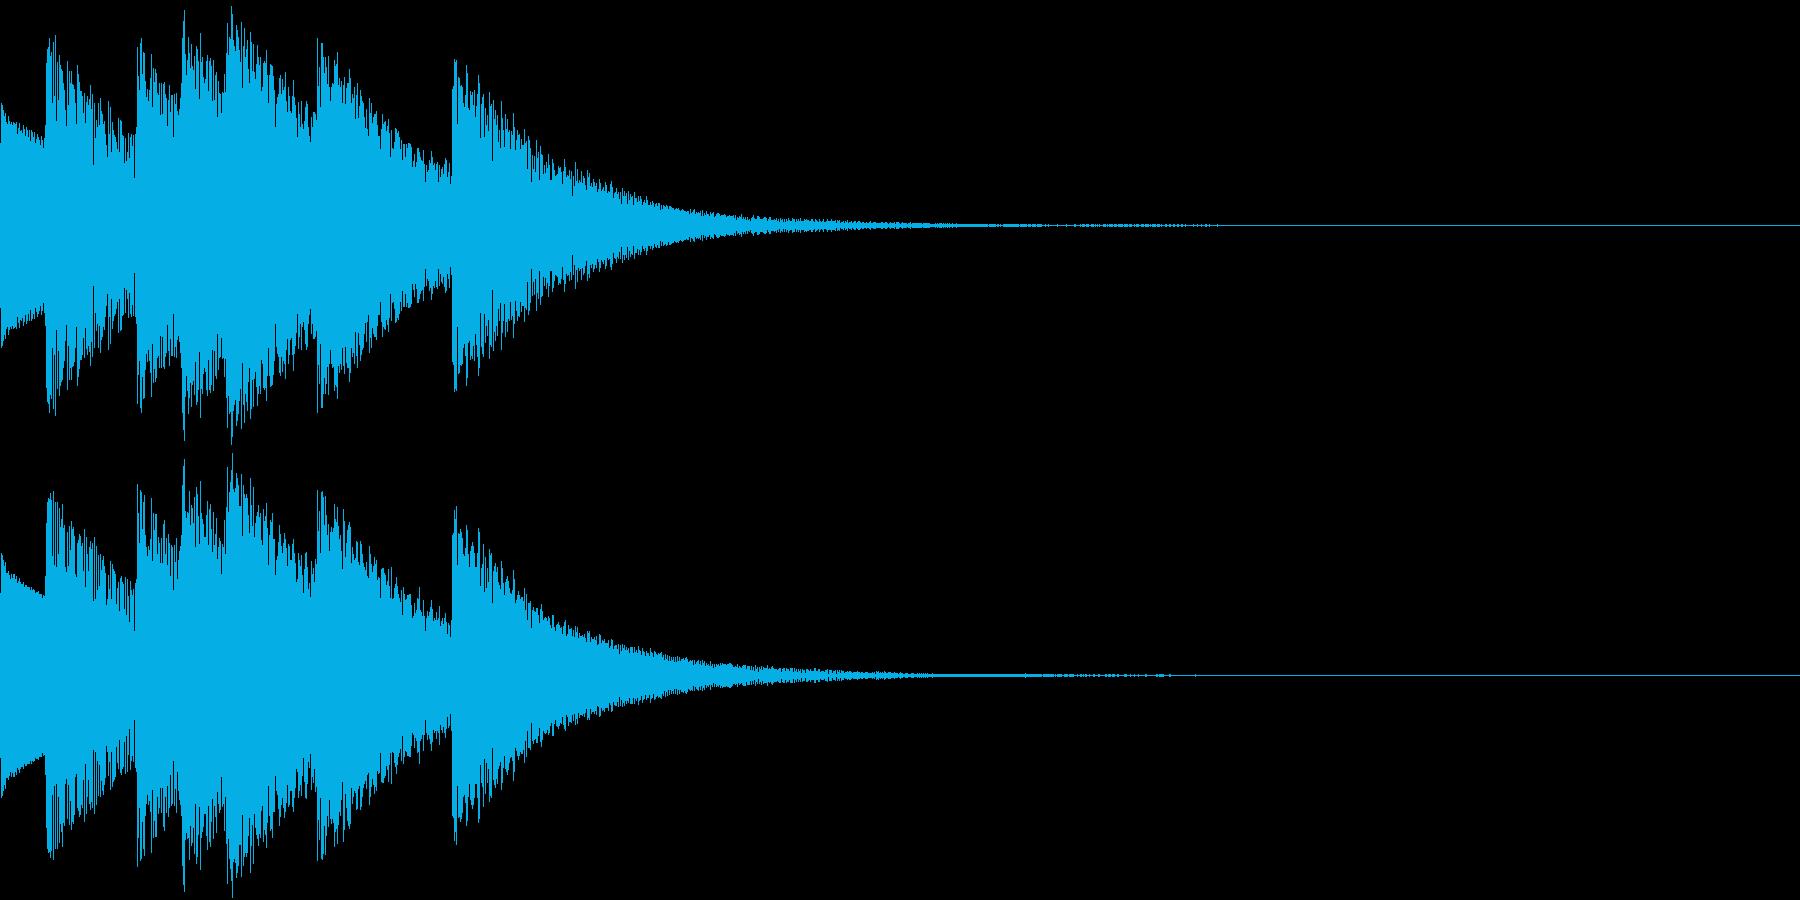 Game ダンジョン 魔法のハープの音の再生済みの波形